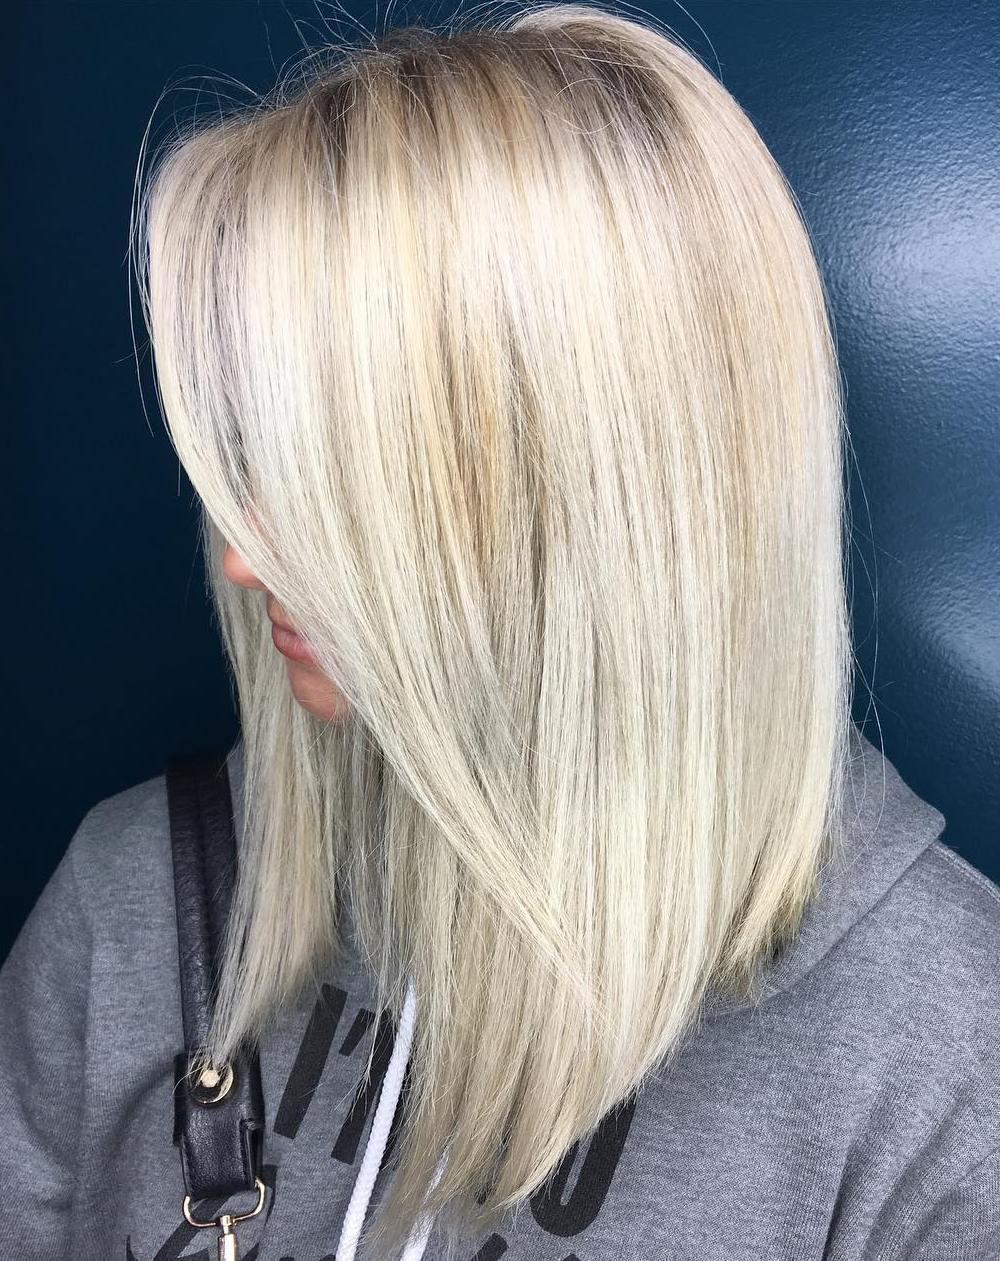 Hairstyles for medium length straight blonde hair